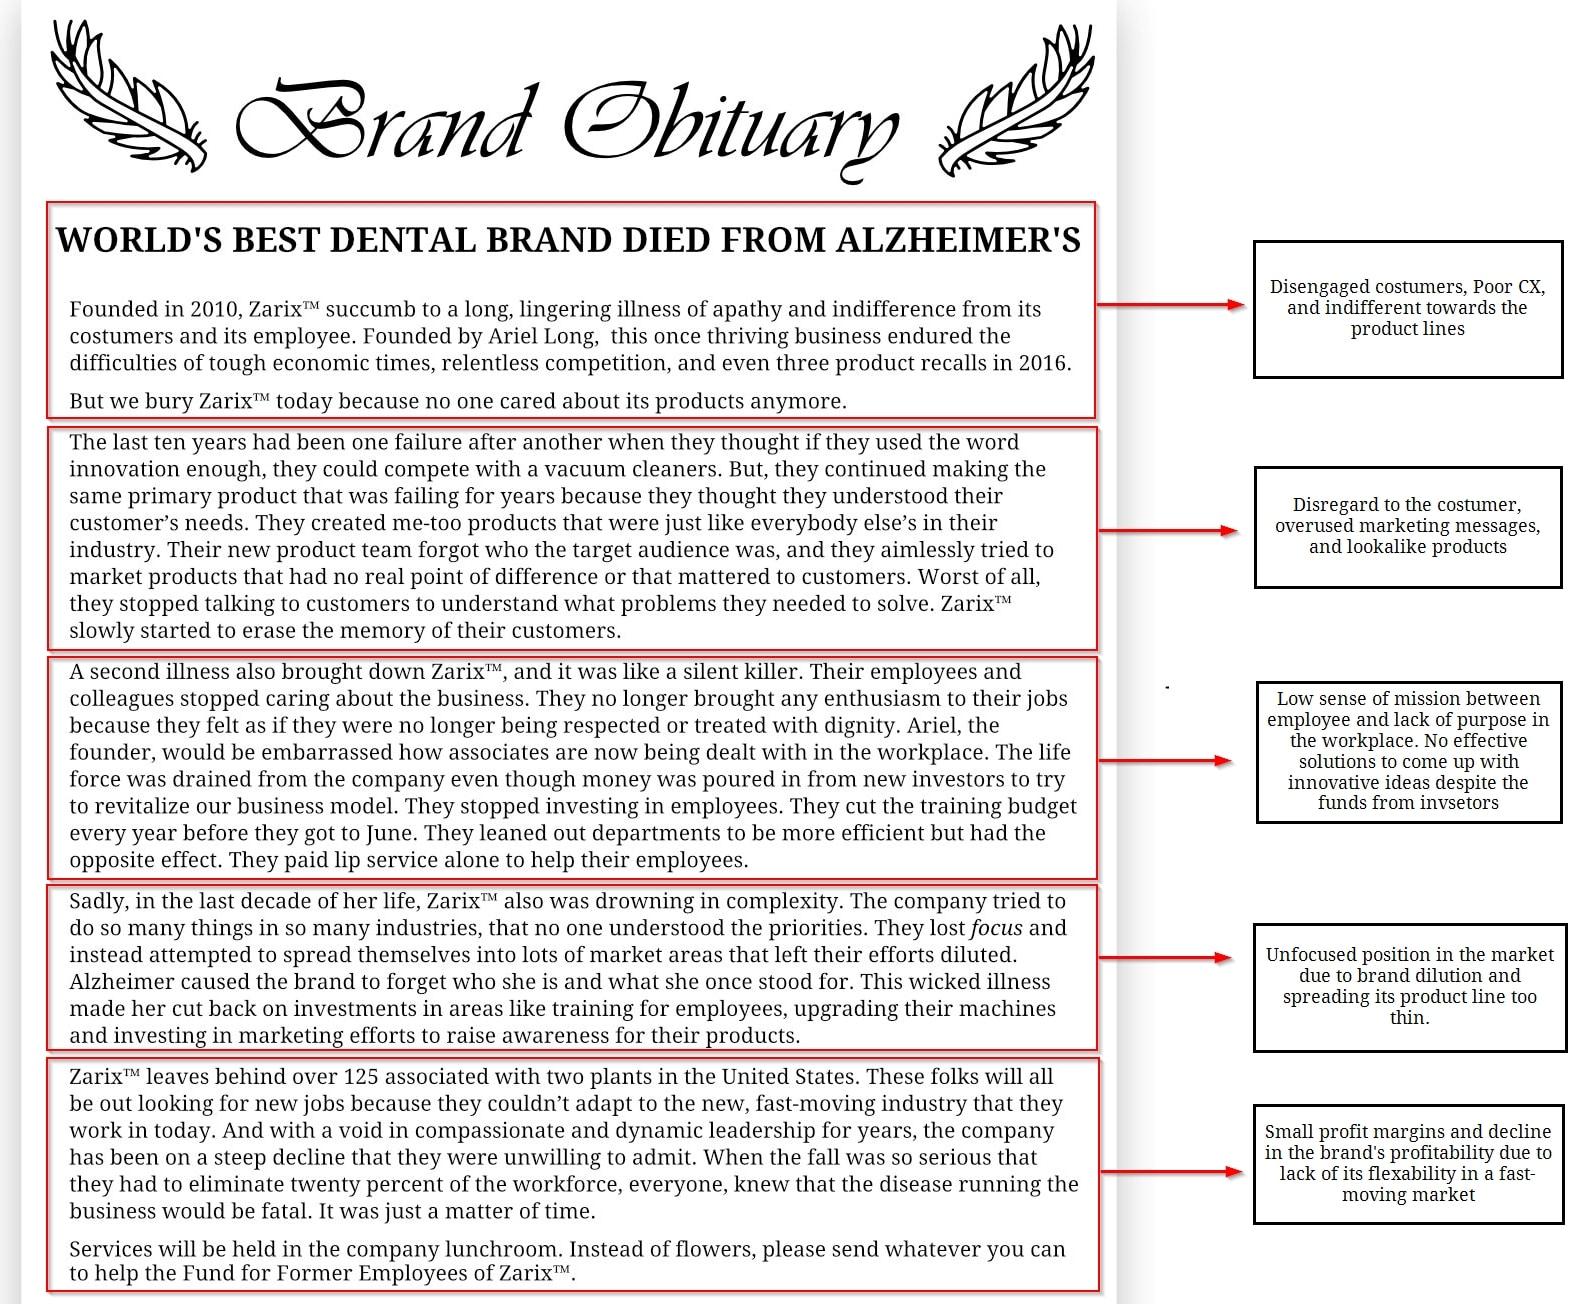 Brand Obituary Example